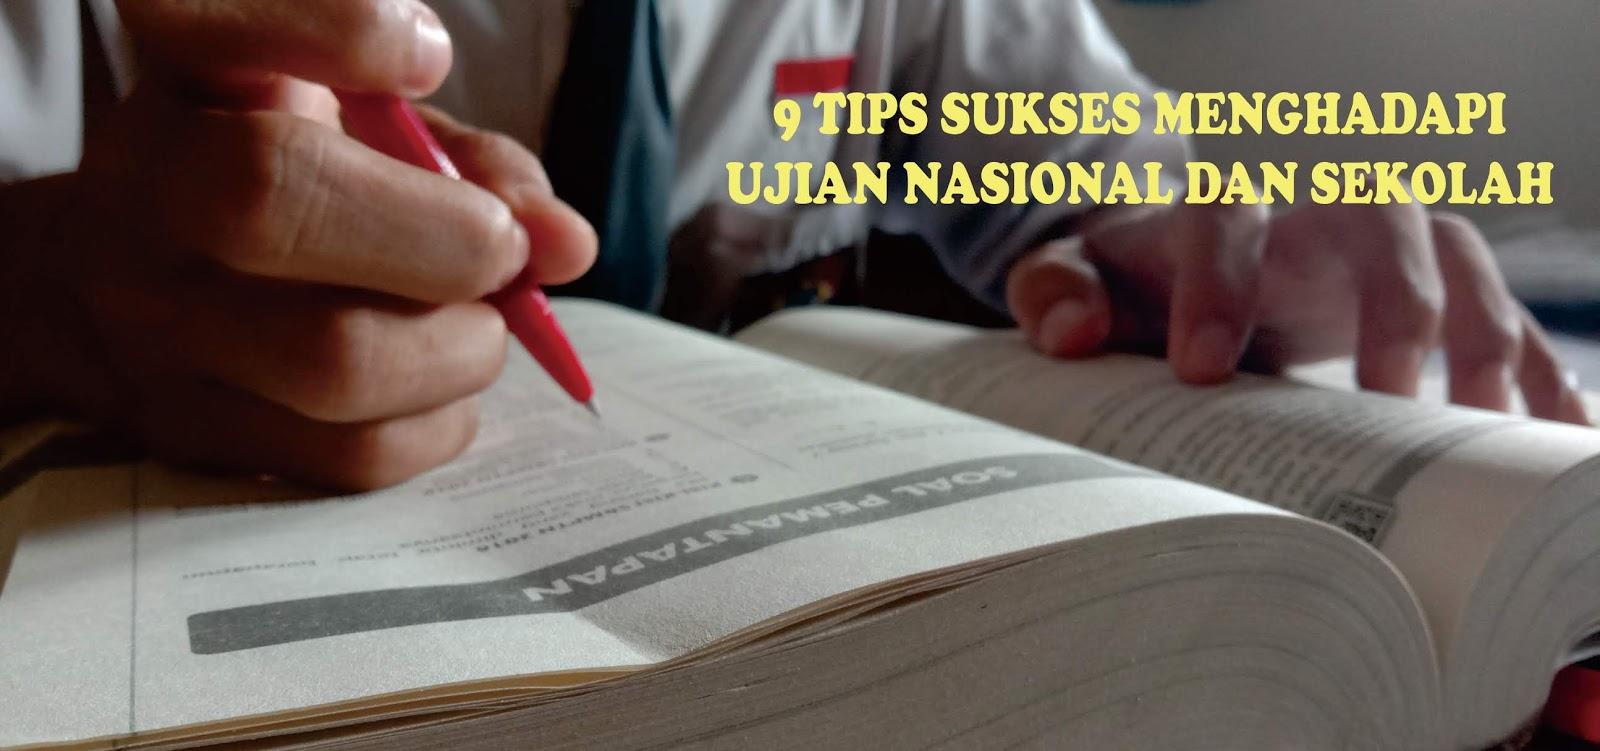 9-tips-sukses-menghadapi-ujian-nasional-dan-ujian-sekolah